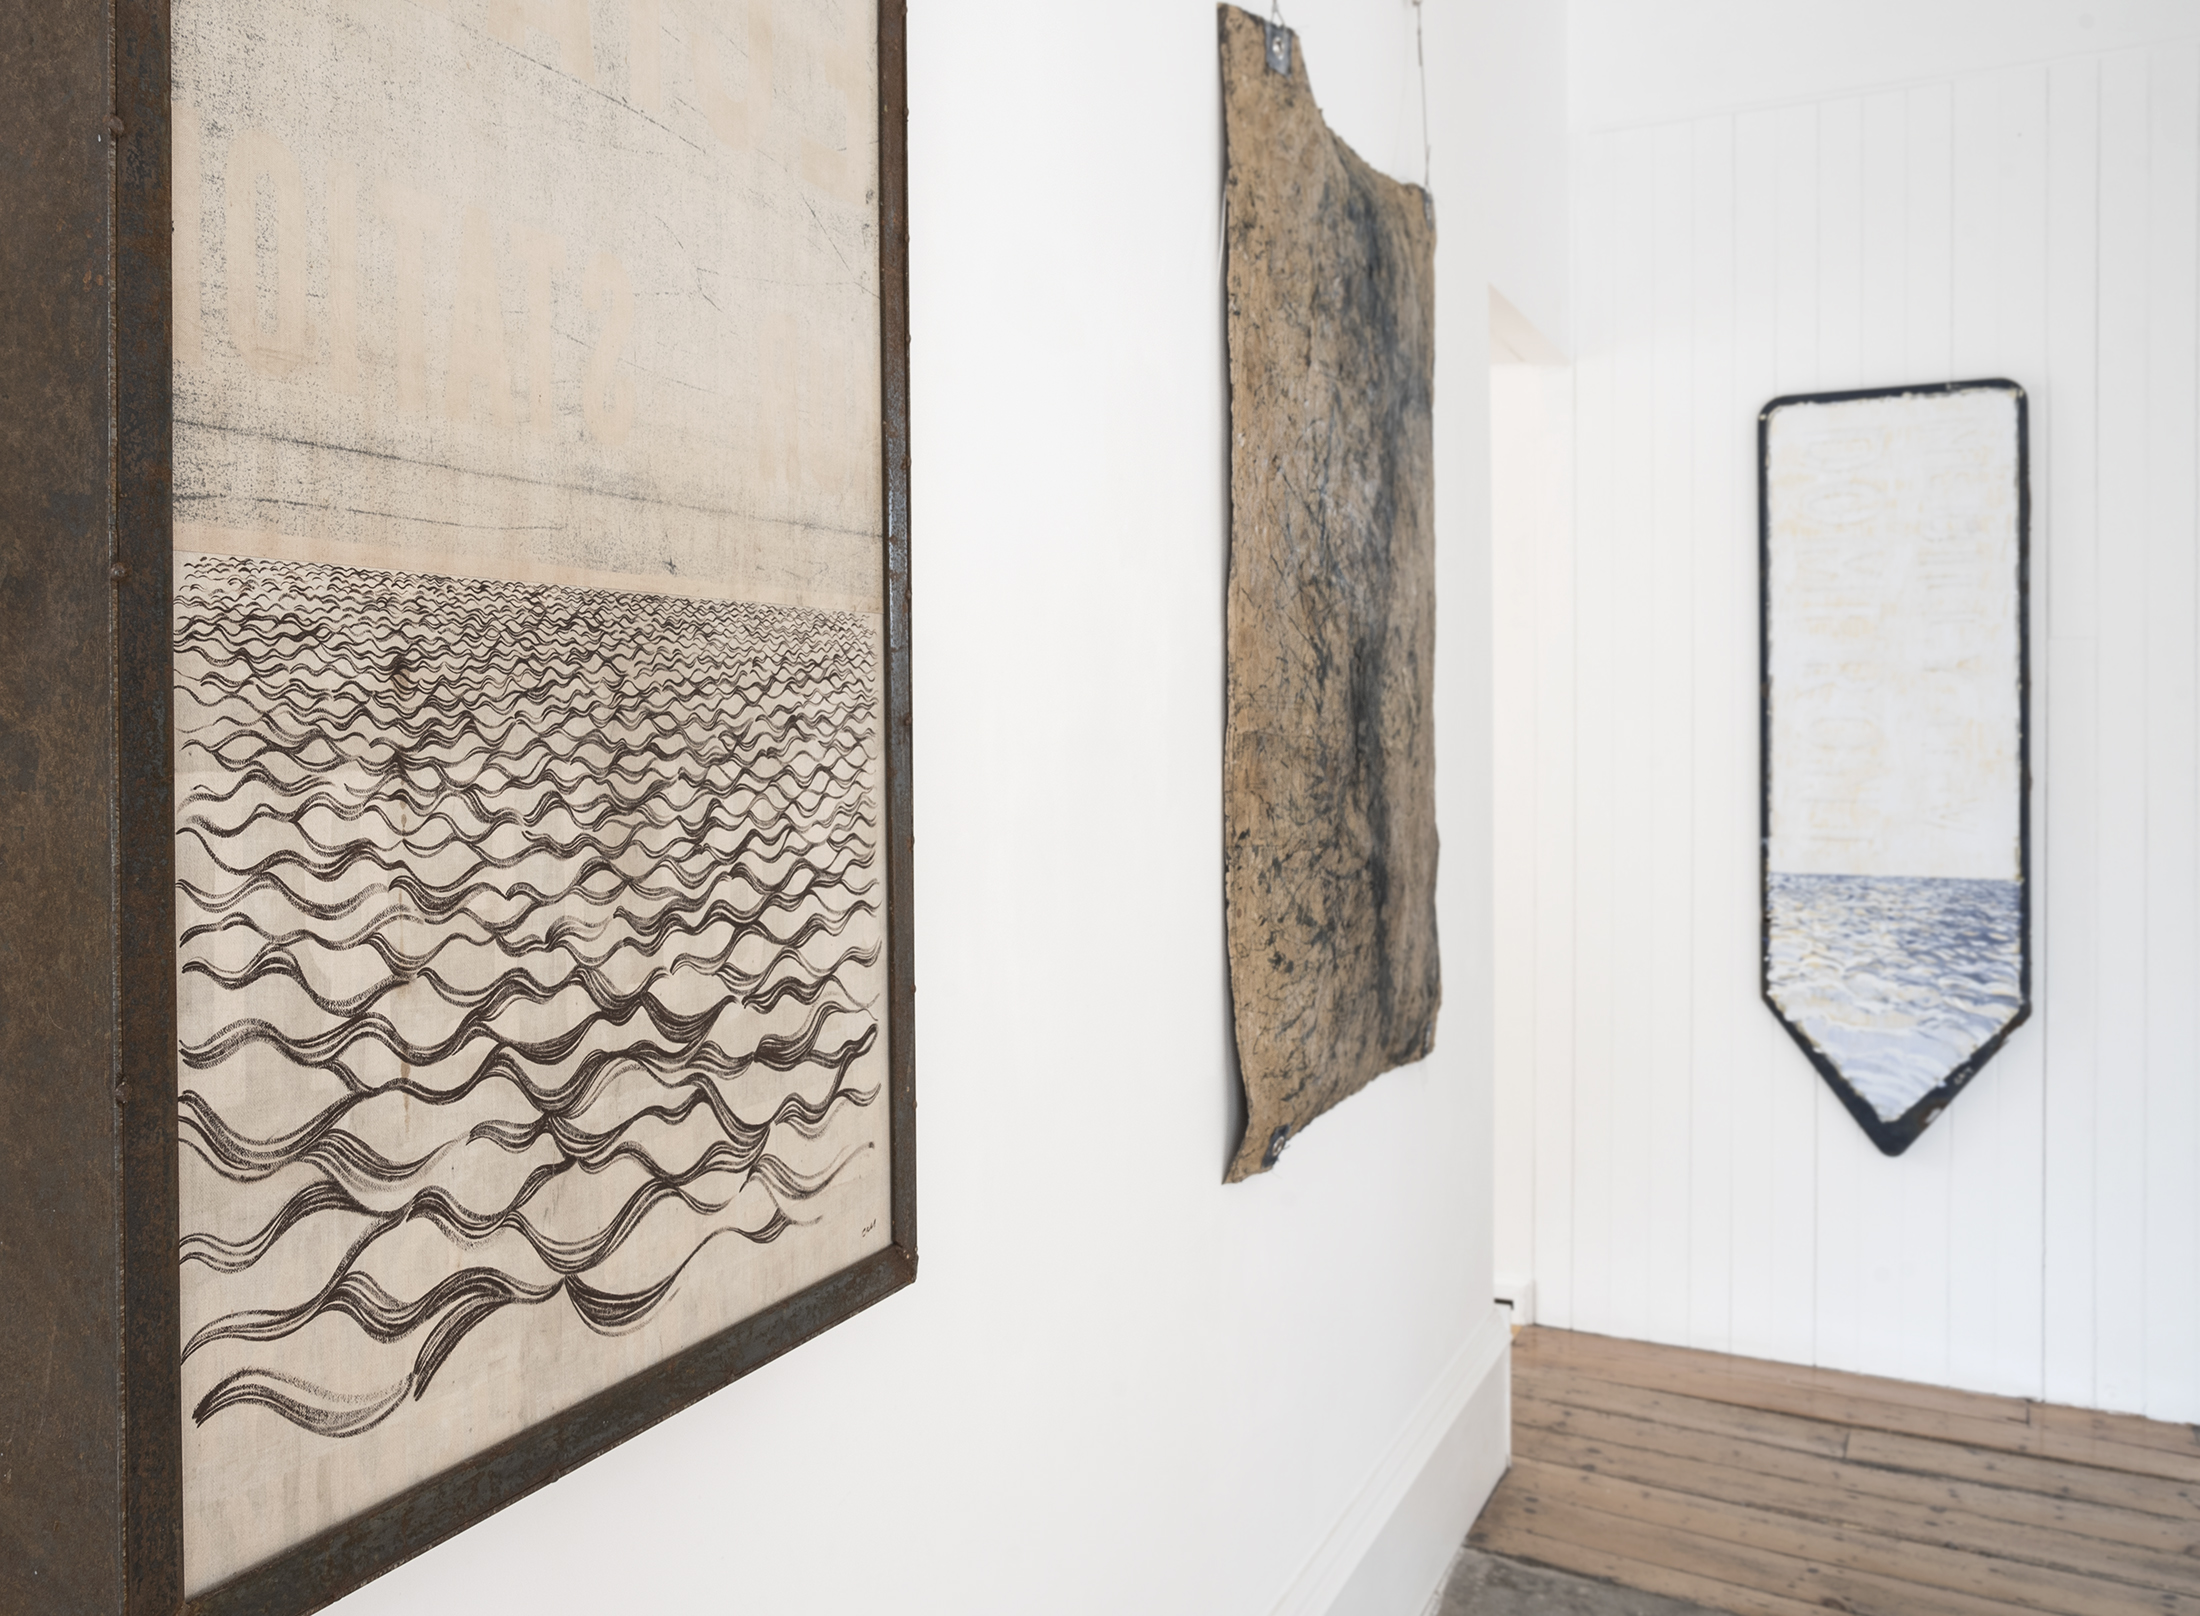 David Cass | Tatha Gallery